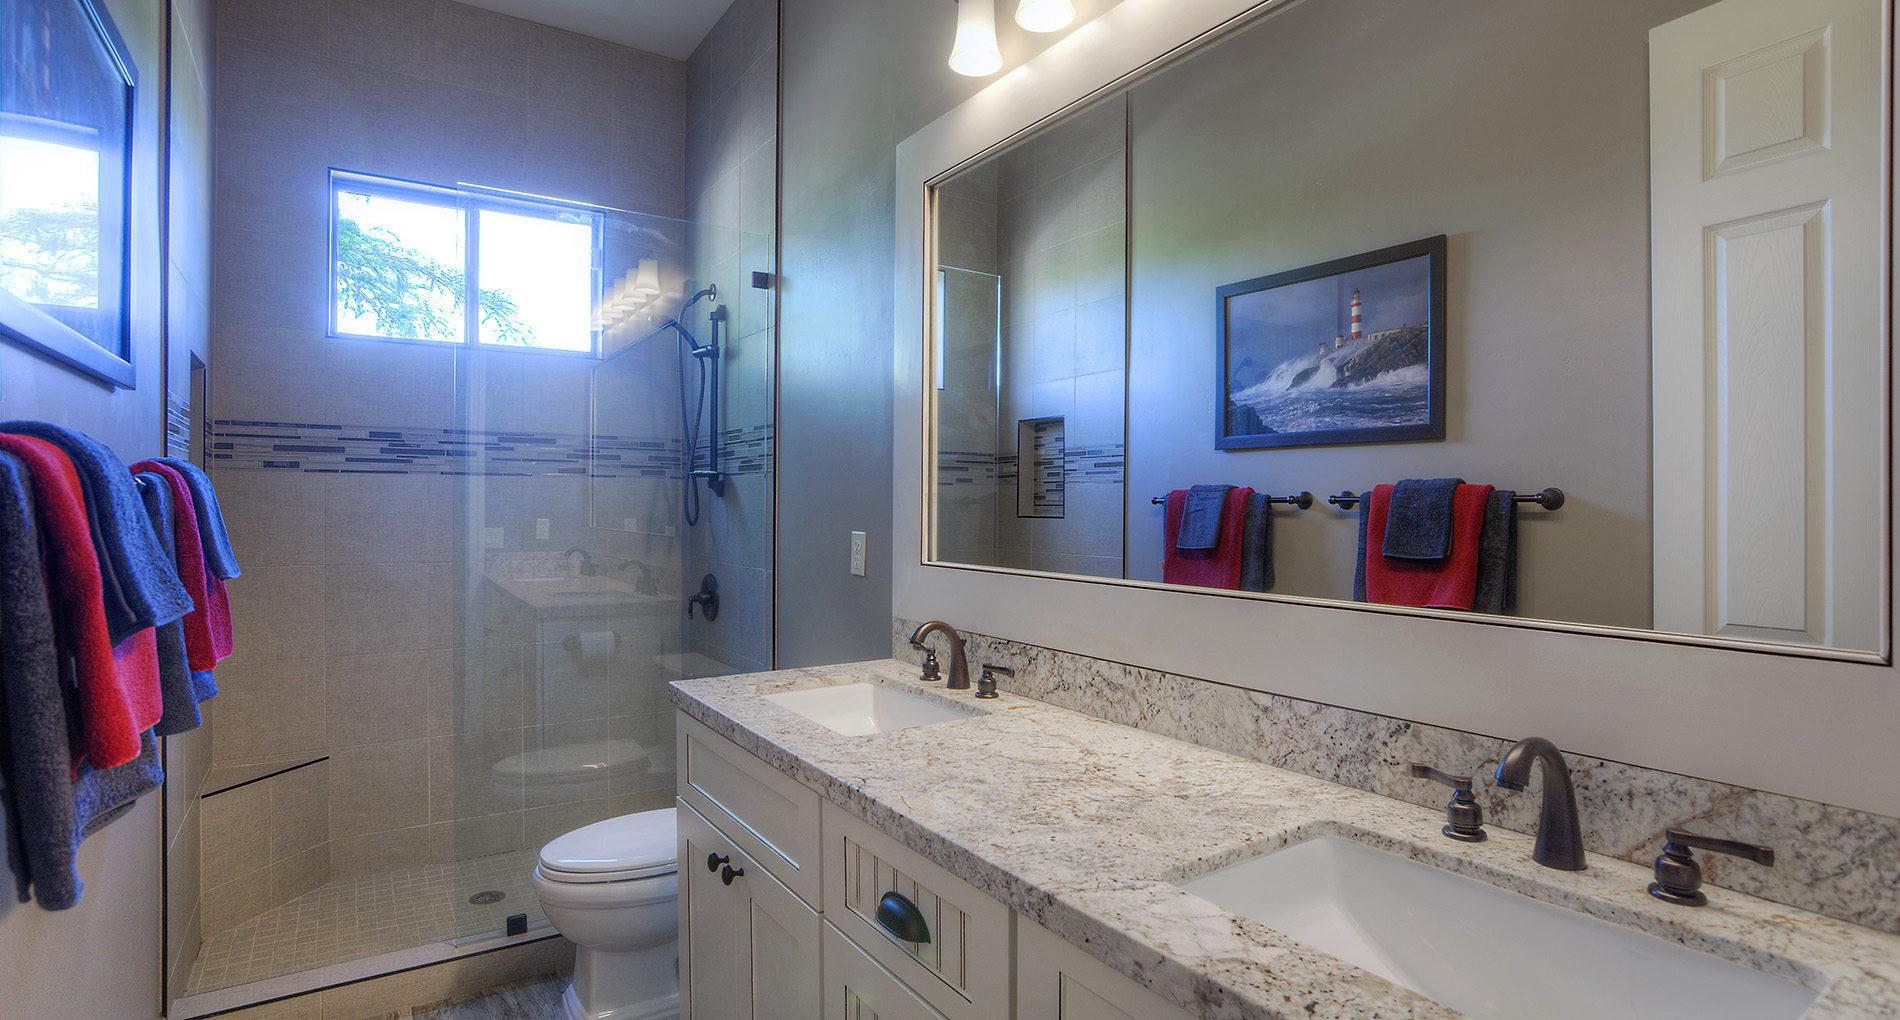 Bathroom Remodel Peoria Dalelane Slider